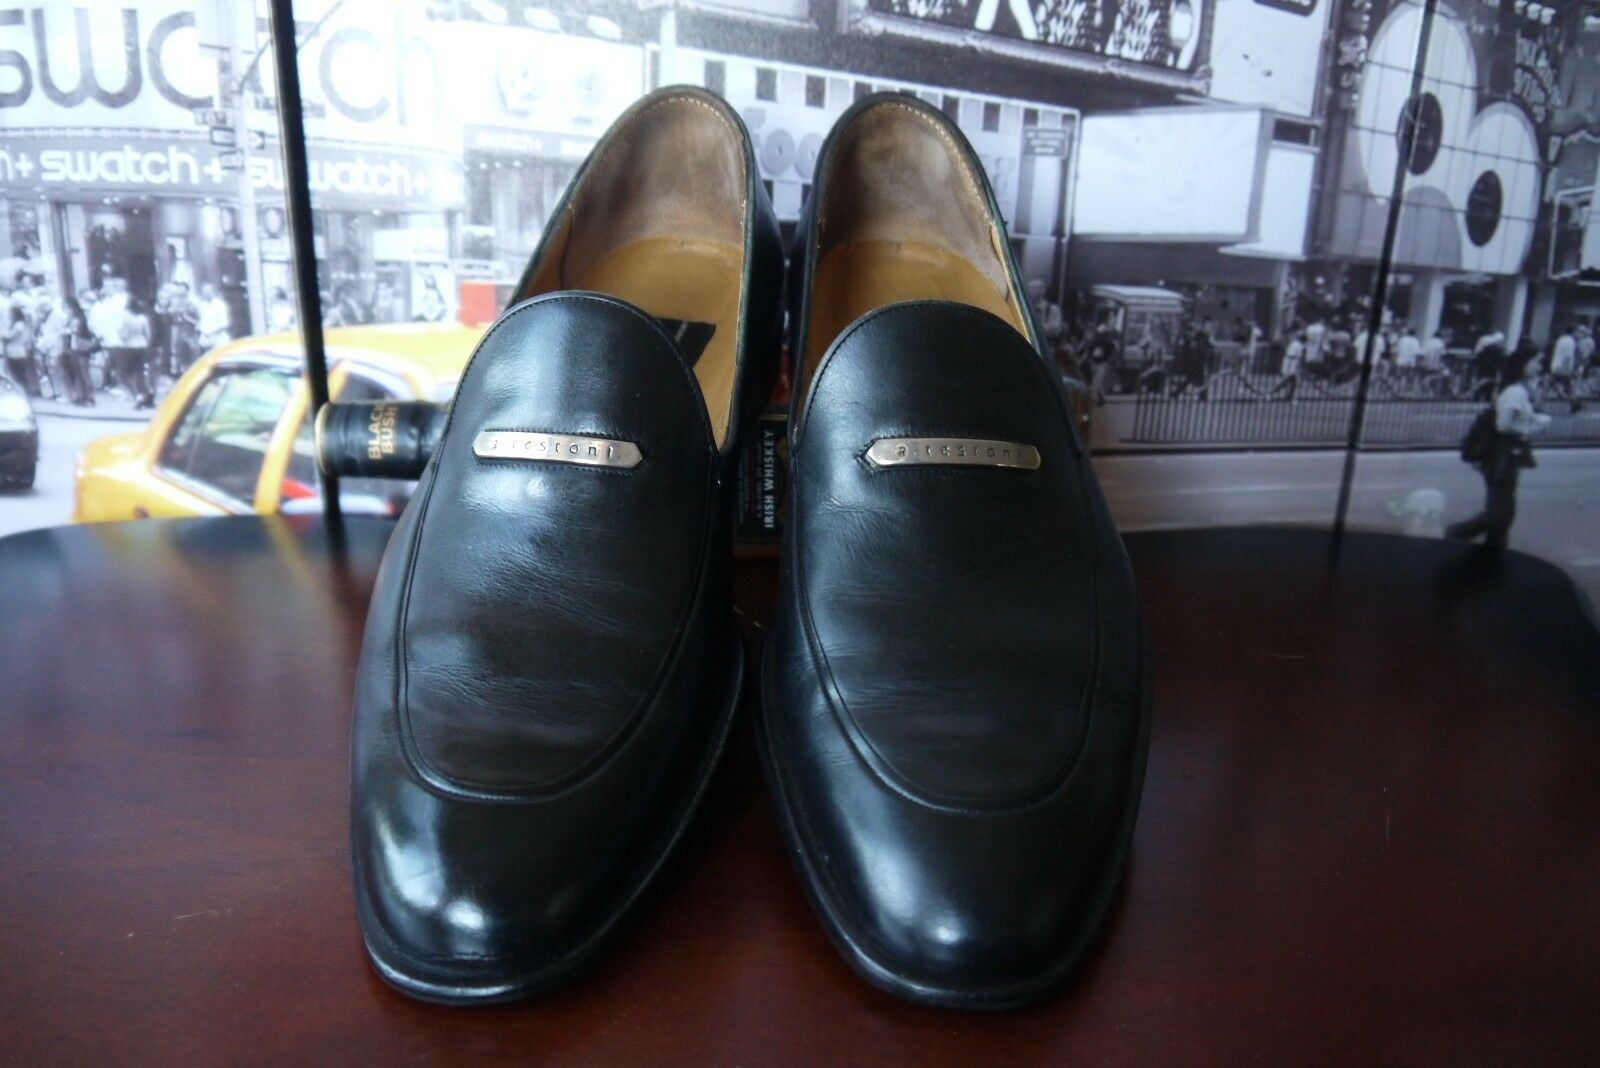 A.testoni Black Label Leather Penny Loafers Apron Toe Logo Emblem Men's US 8 D